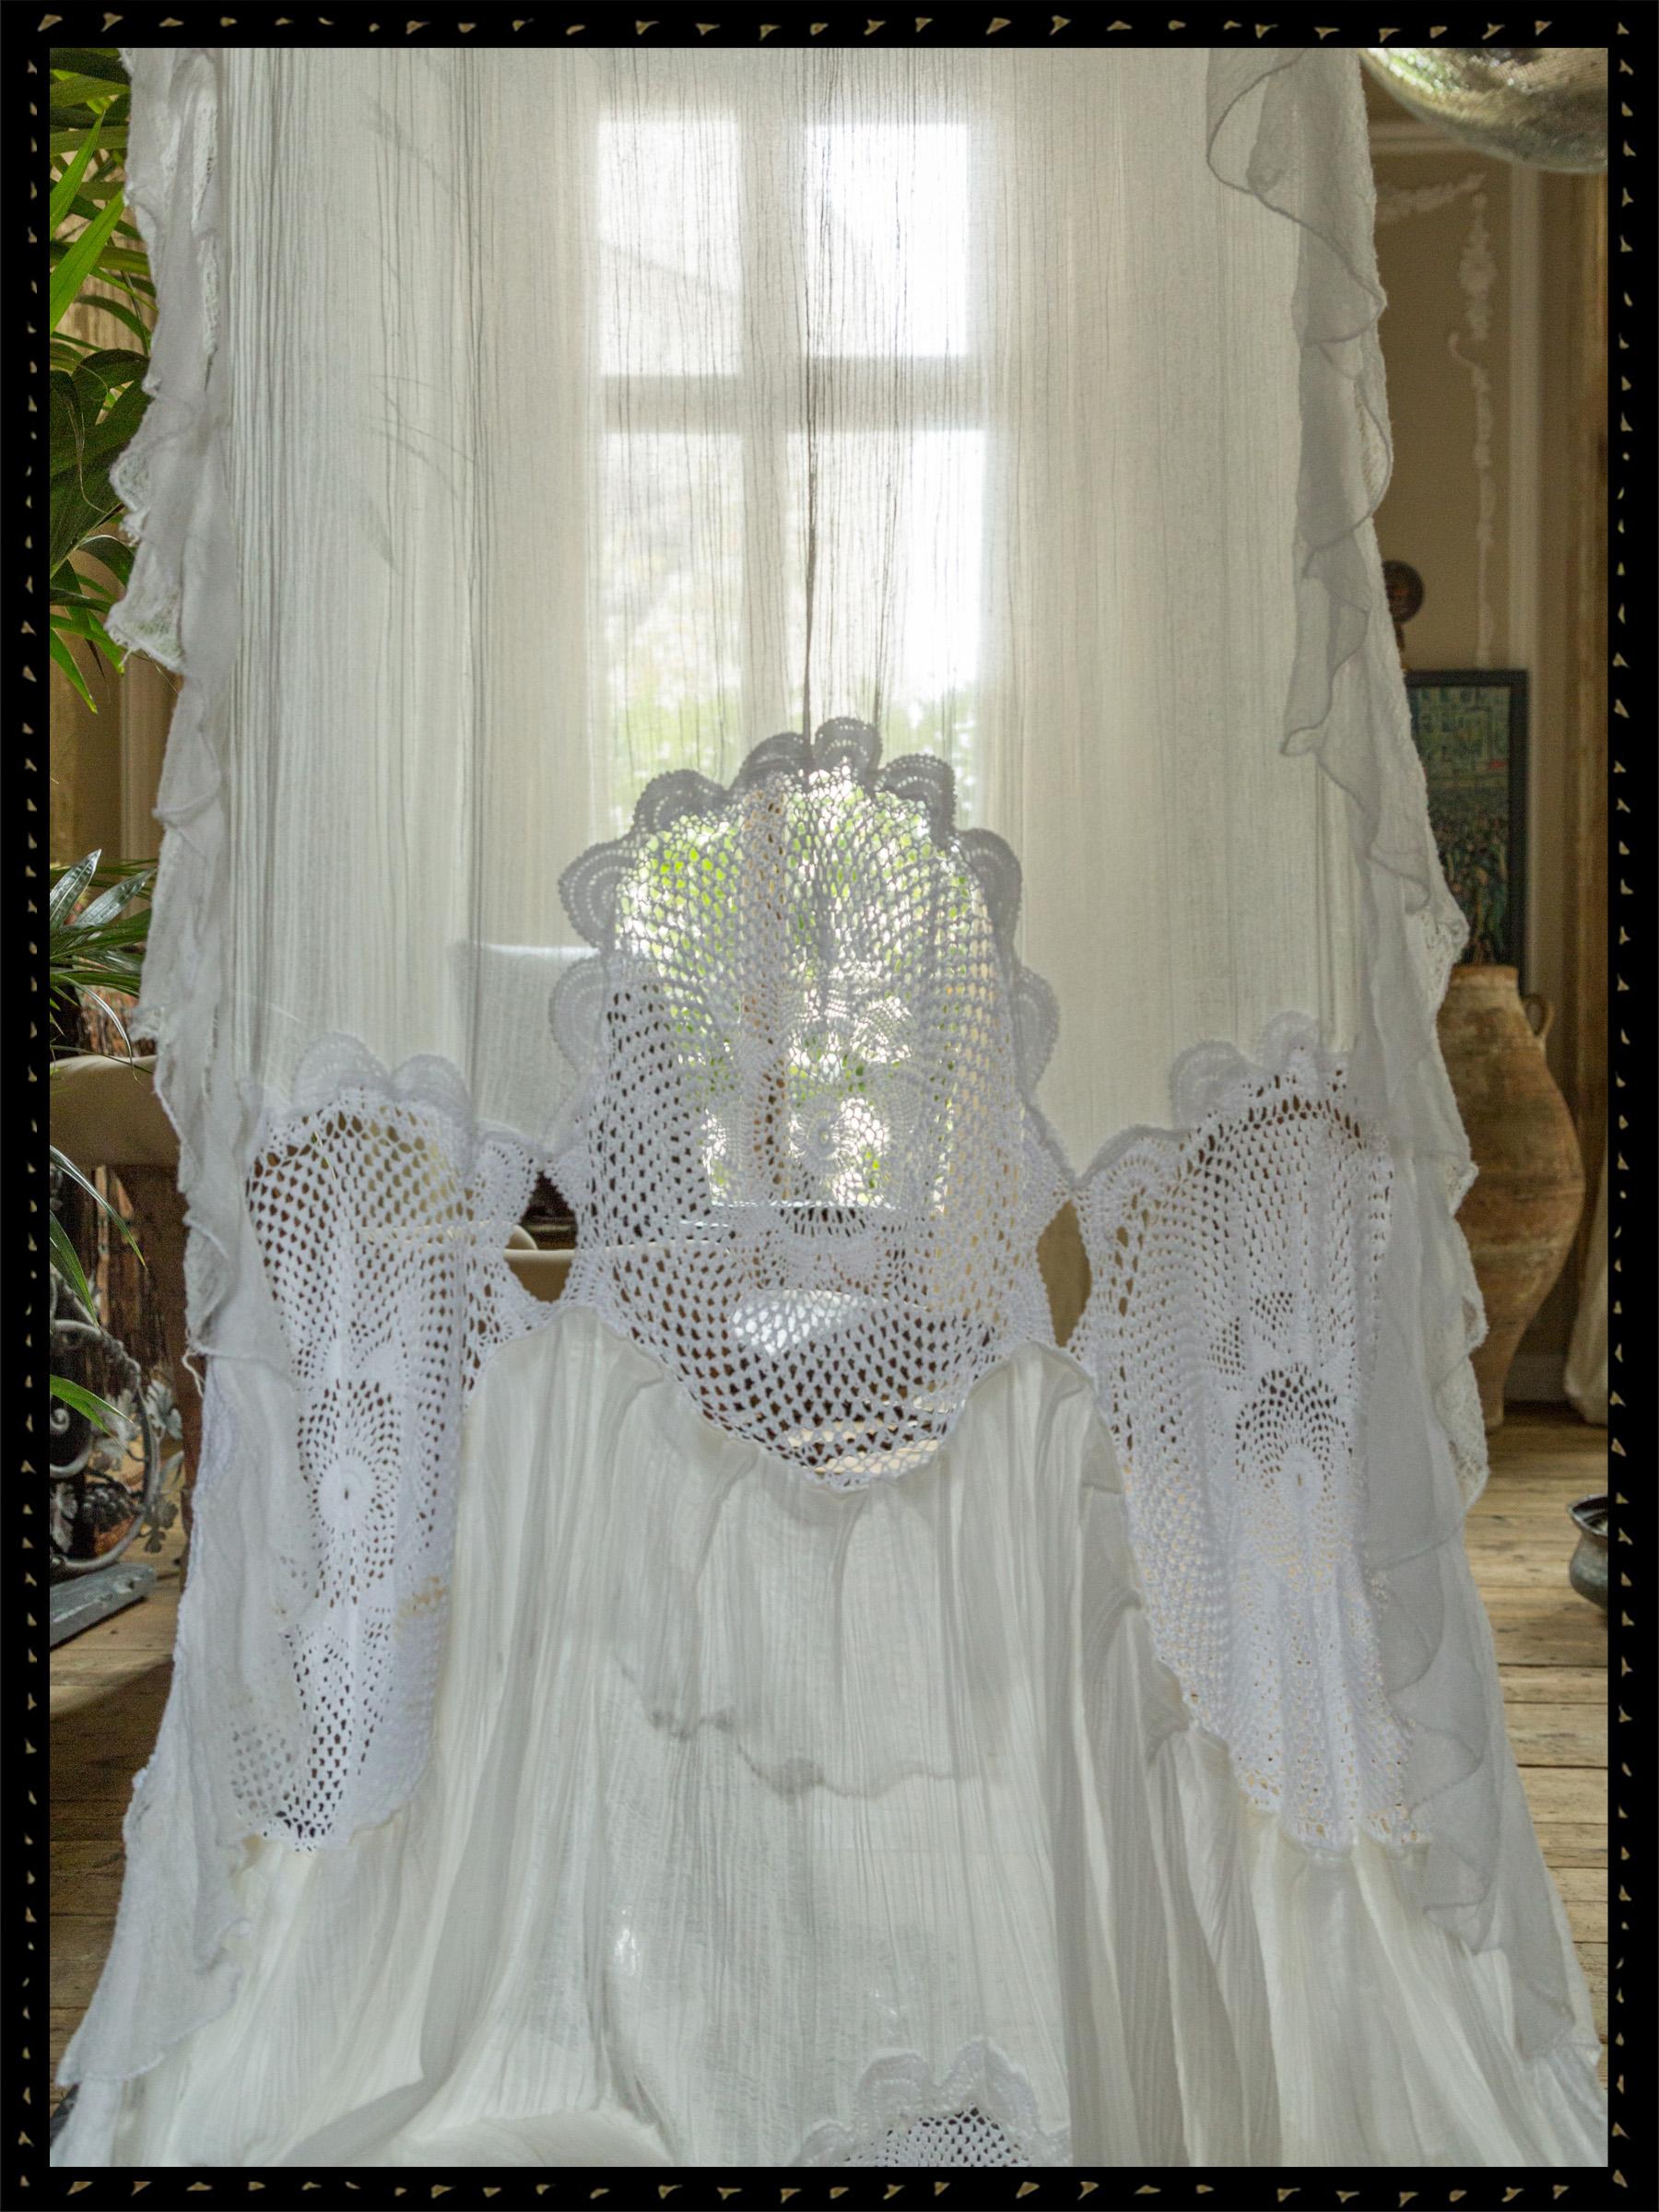 Curtain-6.jpg